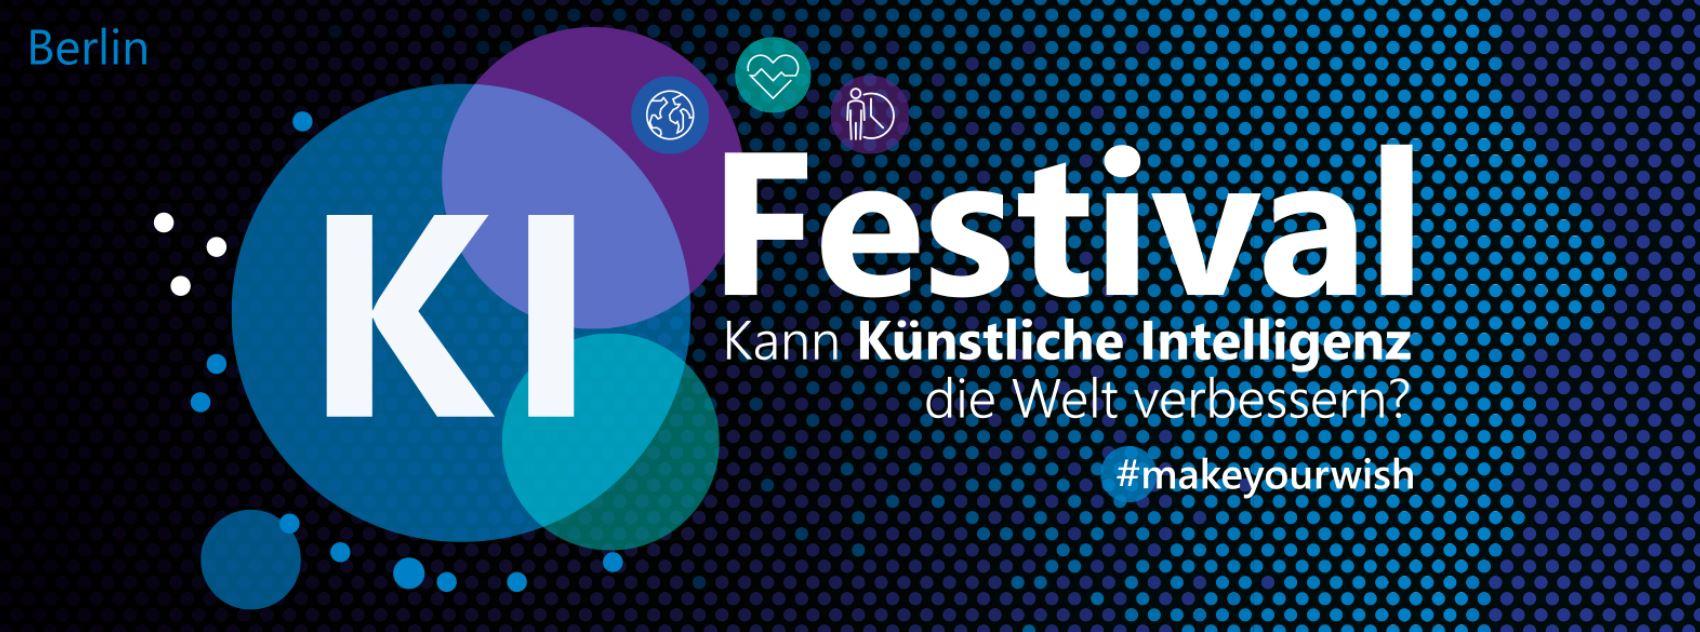 KI Festival 2019 - Make your wish